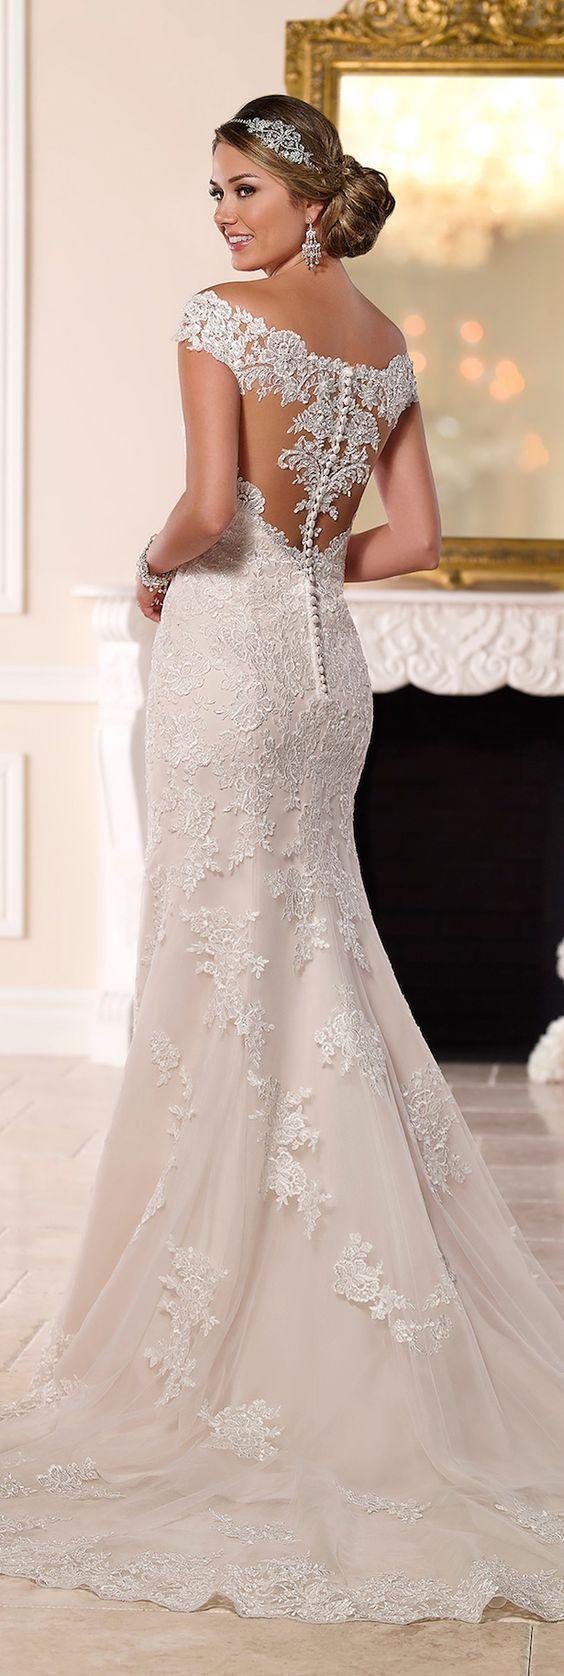 Wedding - Vestidos De Novia